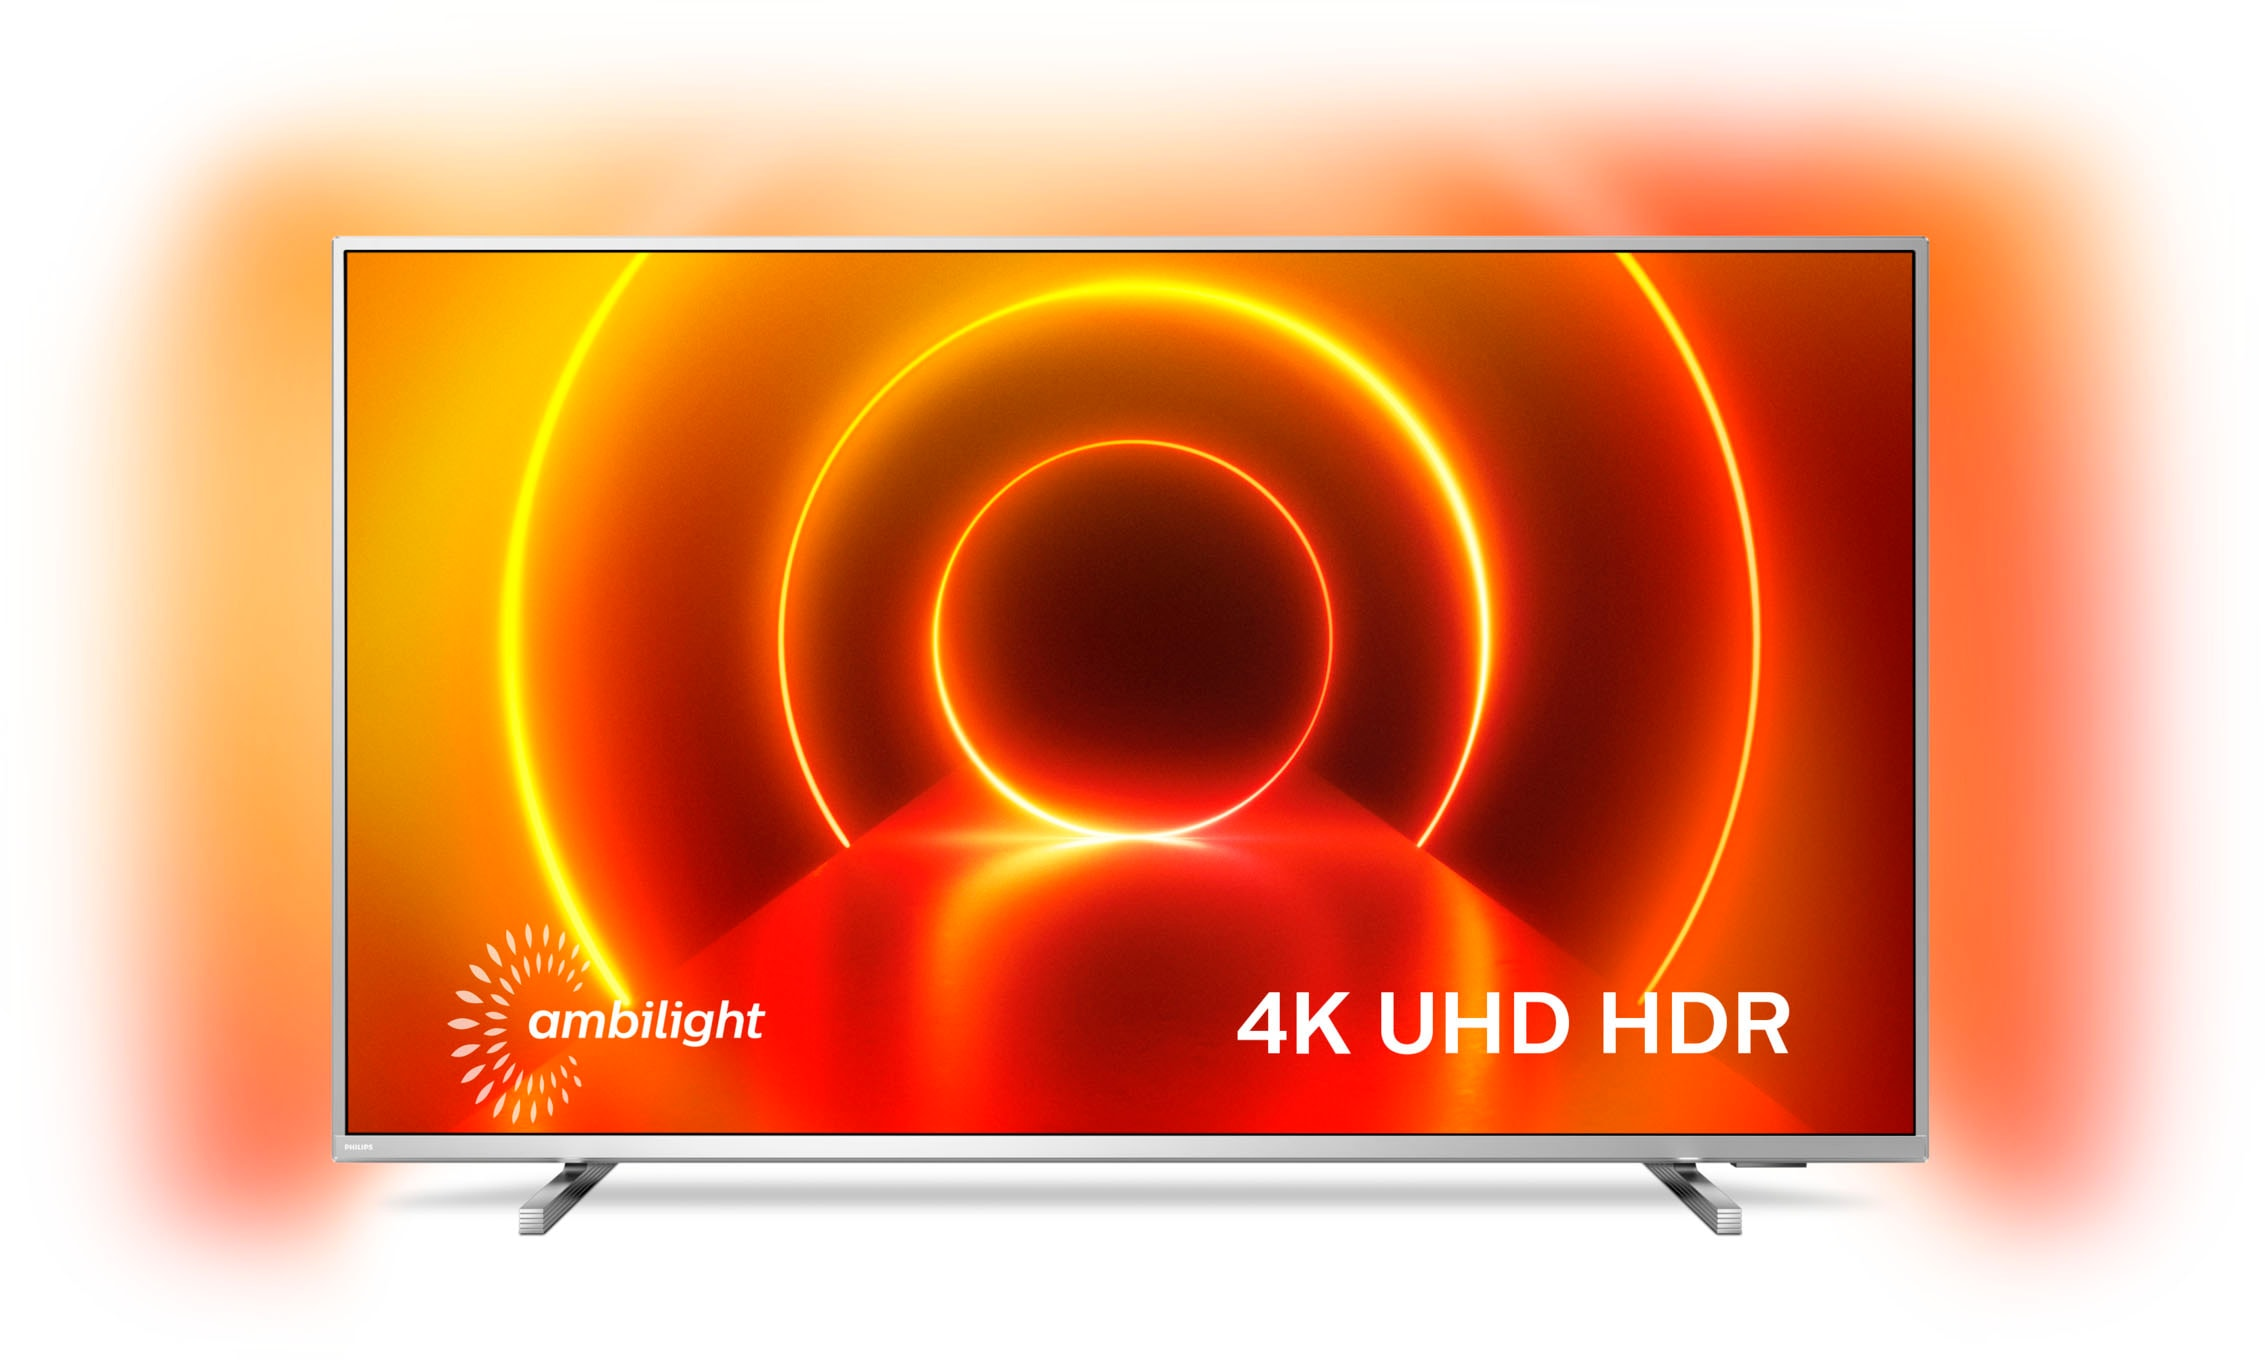 Philips LED-Fernseher 58PUS8105 12 , 146 cm 58 , 4K Ultra HD, Smart-TV, 3-seitiges Ambilght